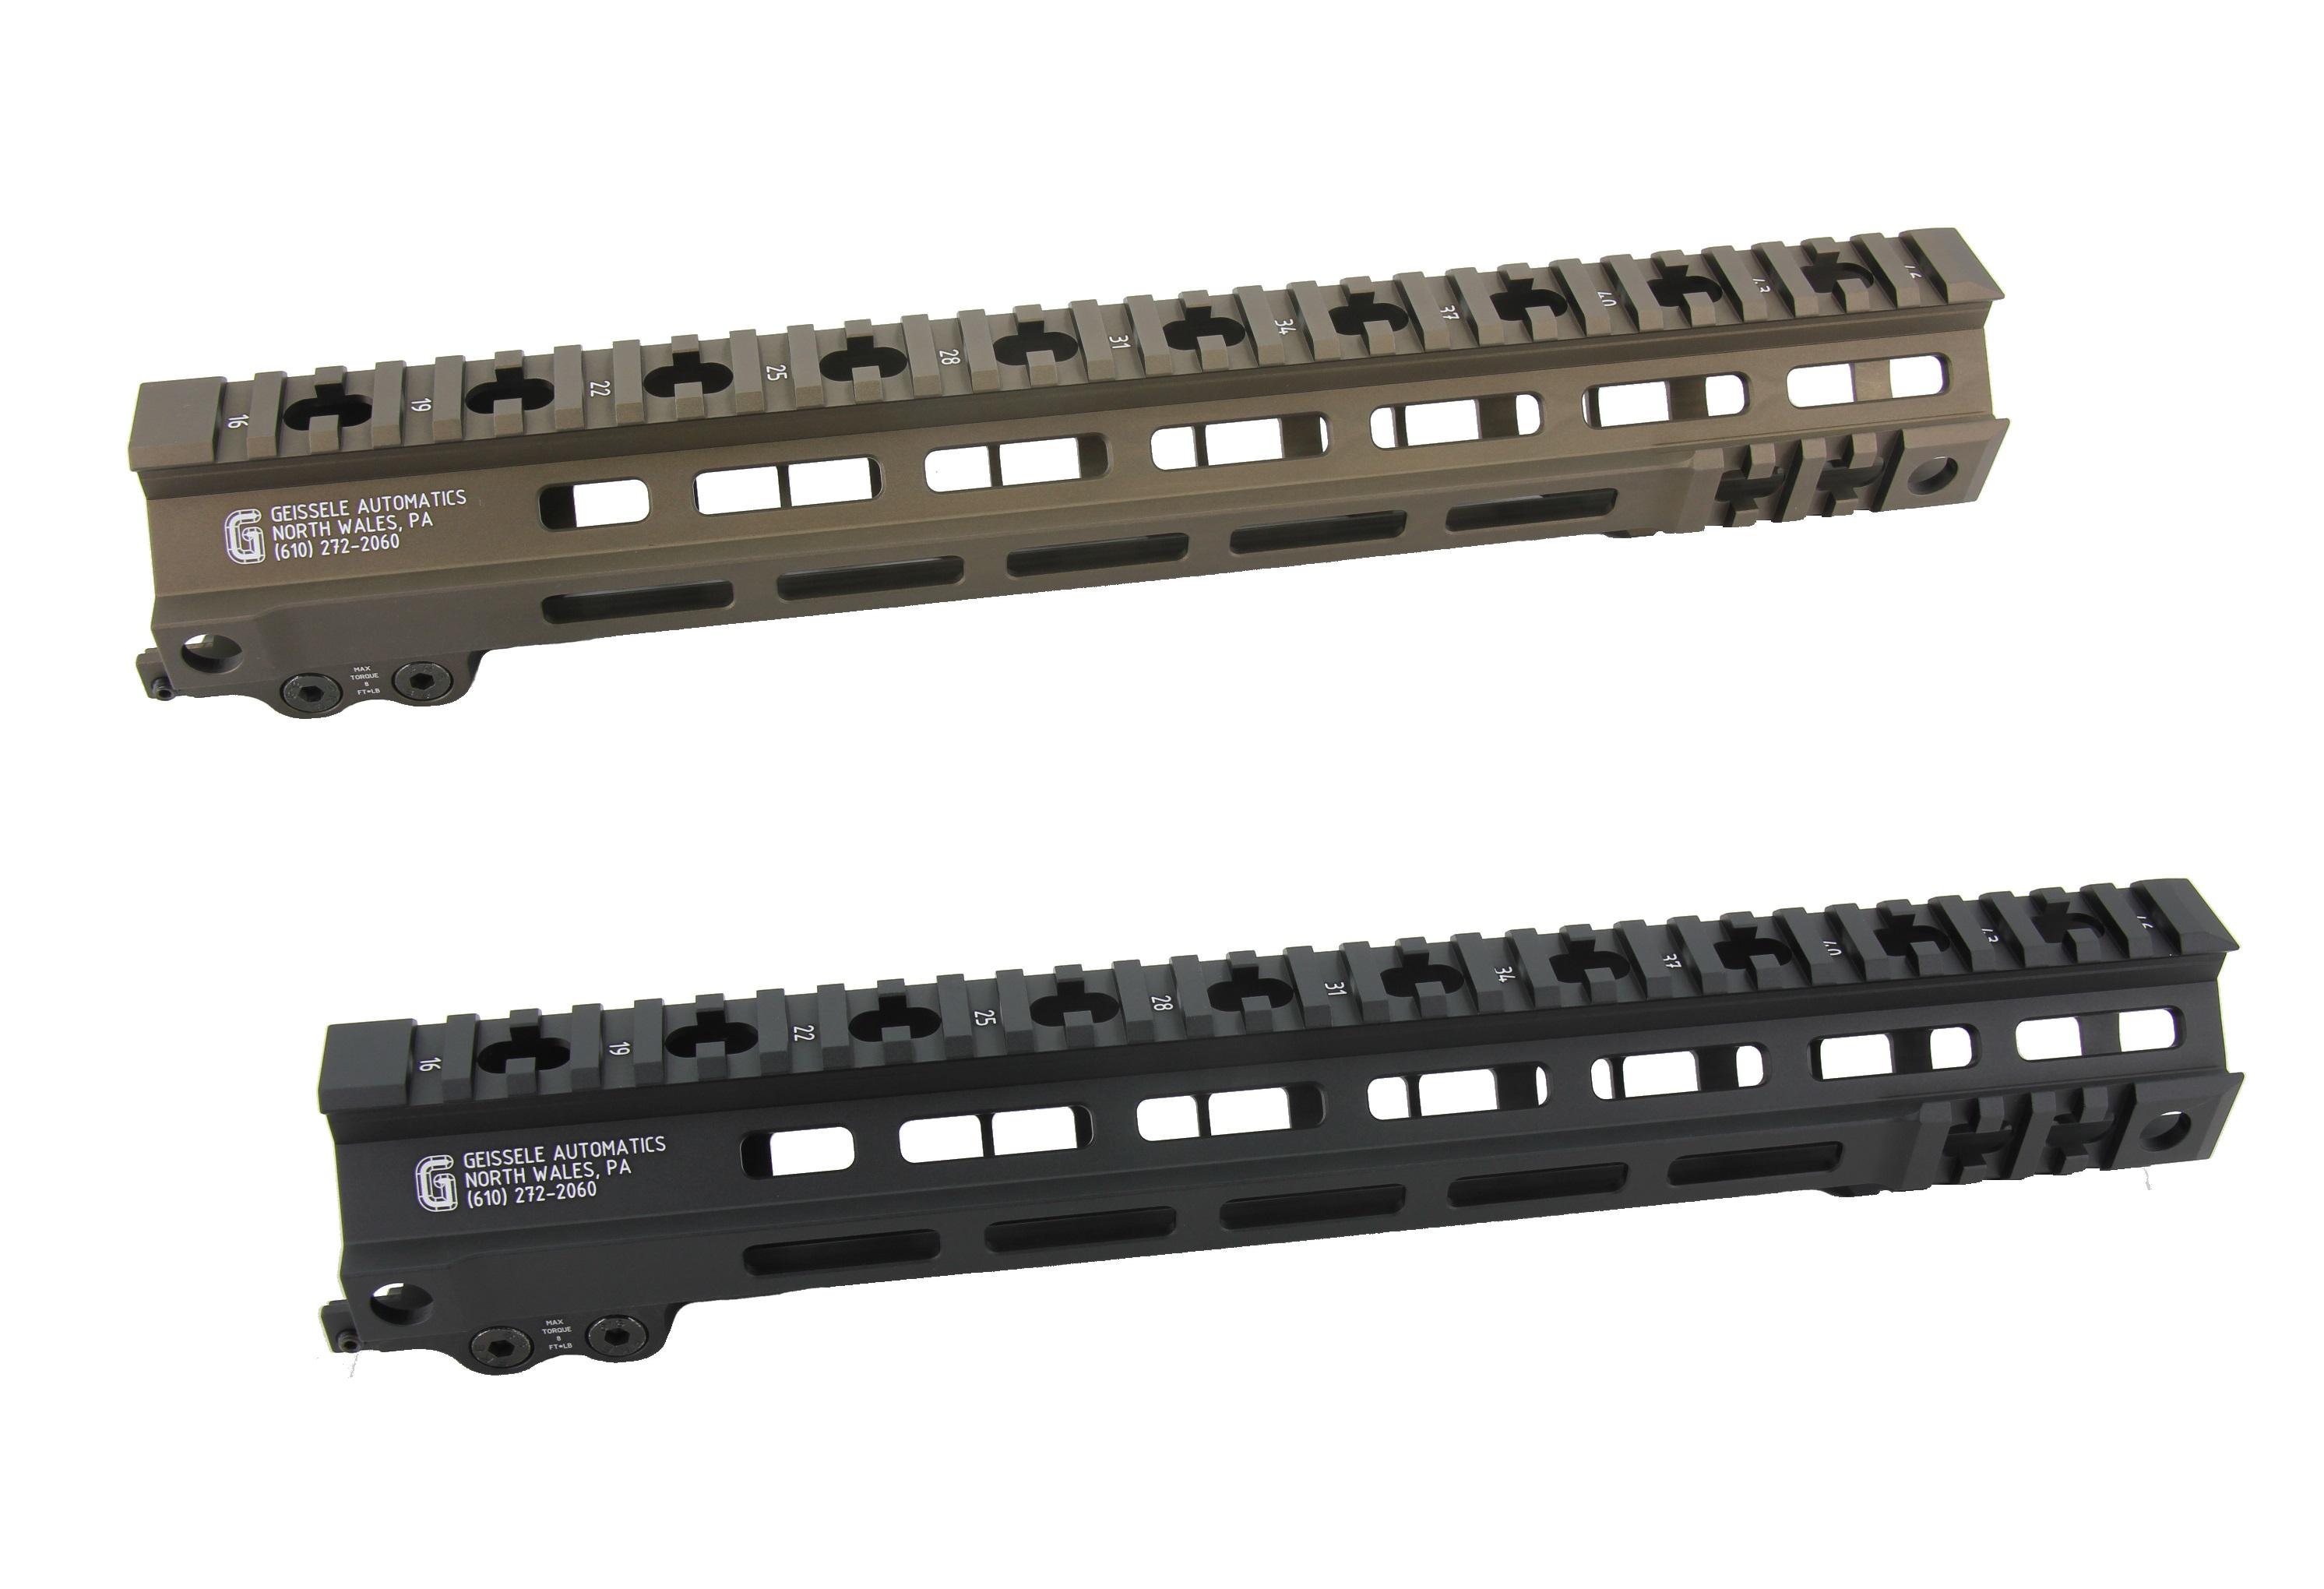 Zparts Geissele MK4タイプ 13'' ハンドガード(MWS/VFC/PTW/GHK/WE対応)